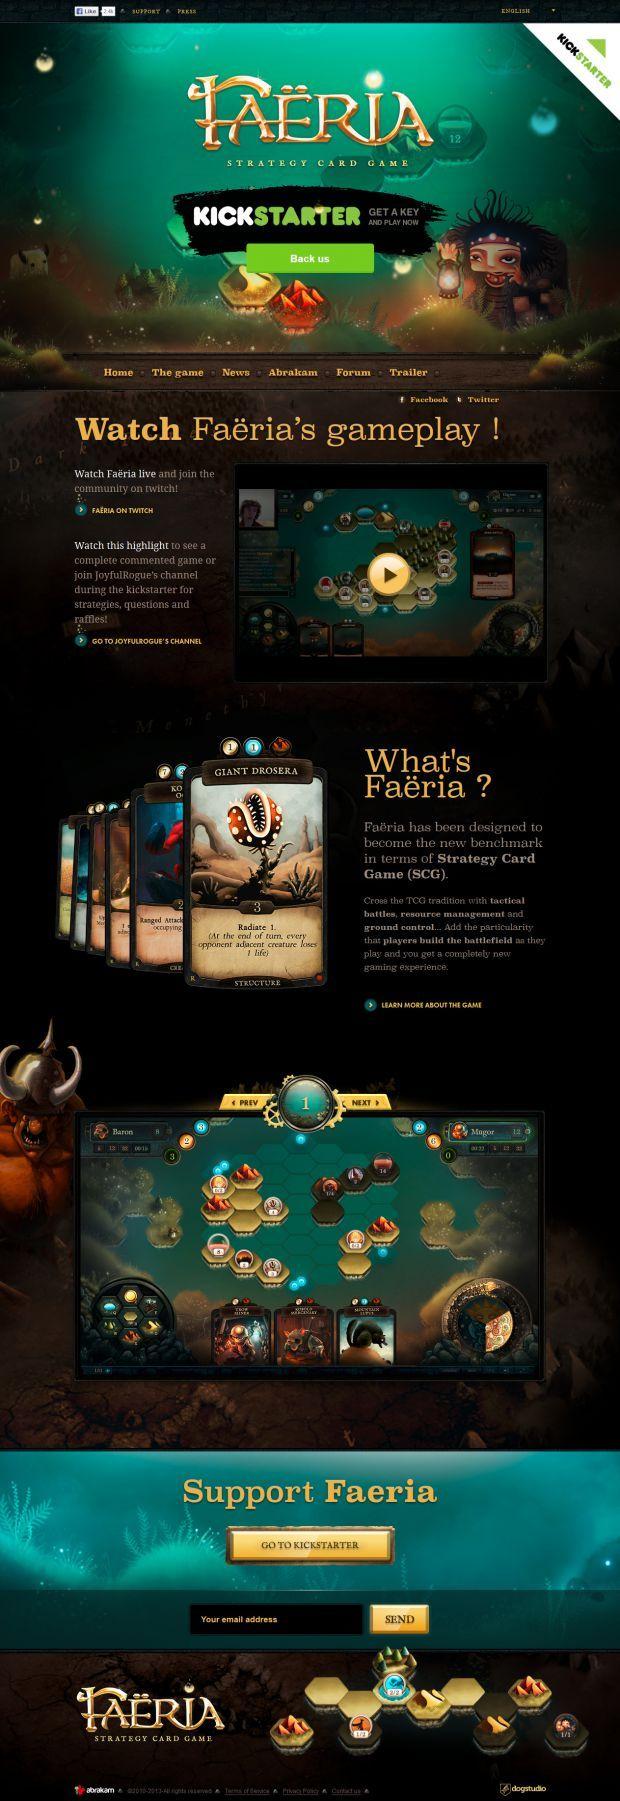 Faeria - Strategy Card Game | #webdesign #it #web #design #layout #userinterface #website #webdesign < repinned by www.BlickeDeeler.de | Take a look at www.WebsiteDesign-Hamburg.de